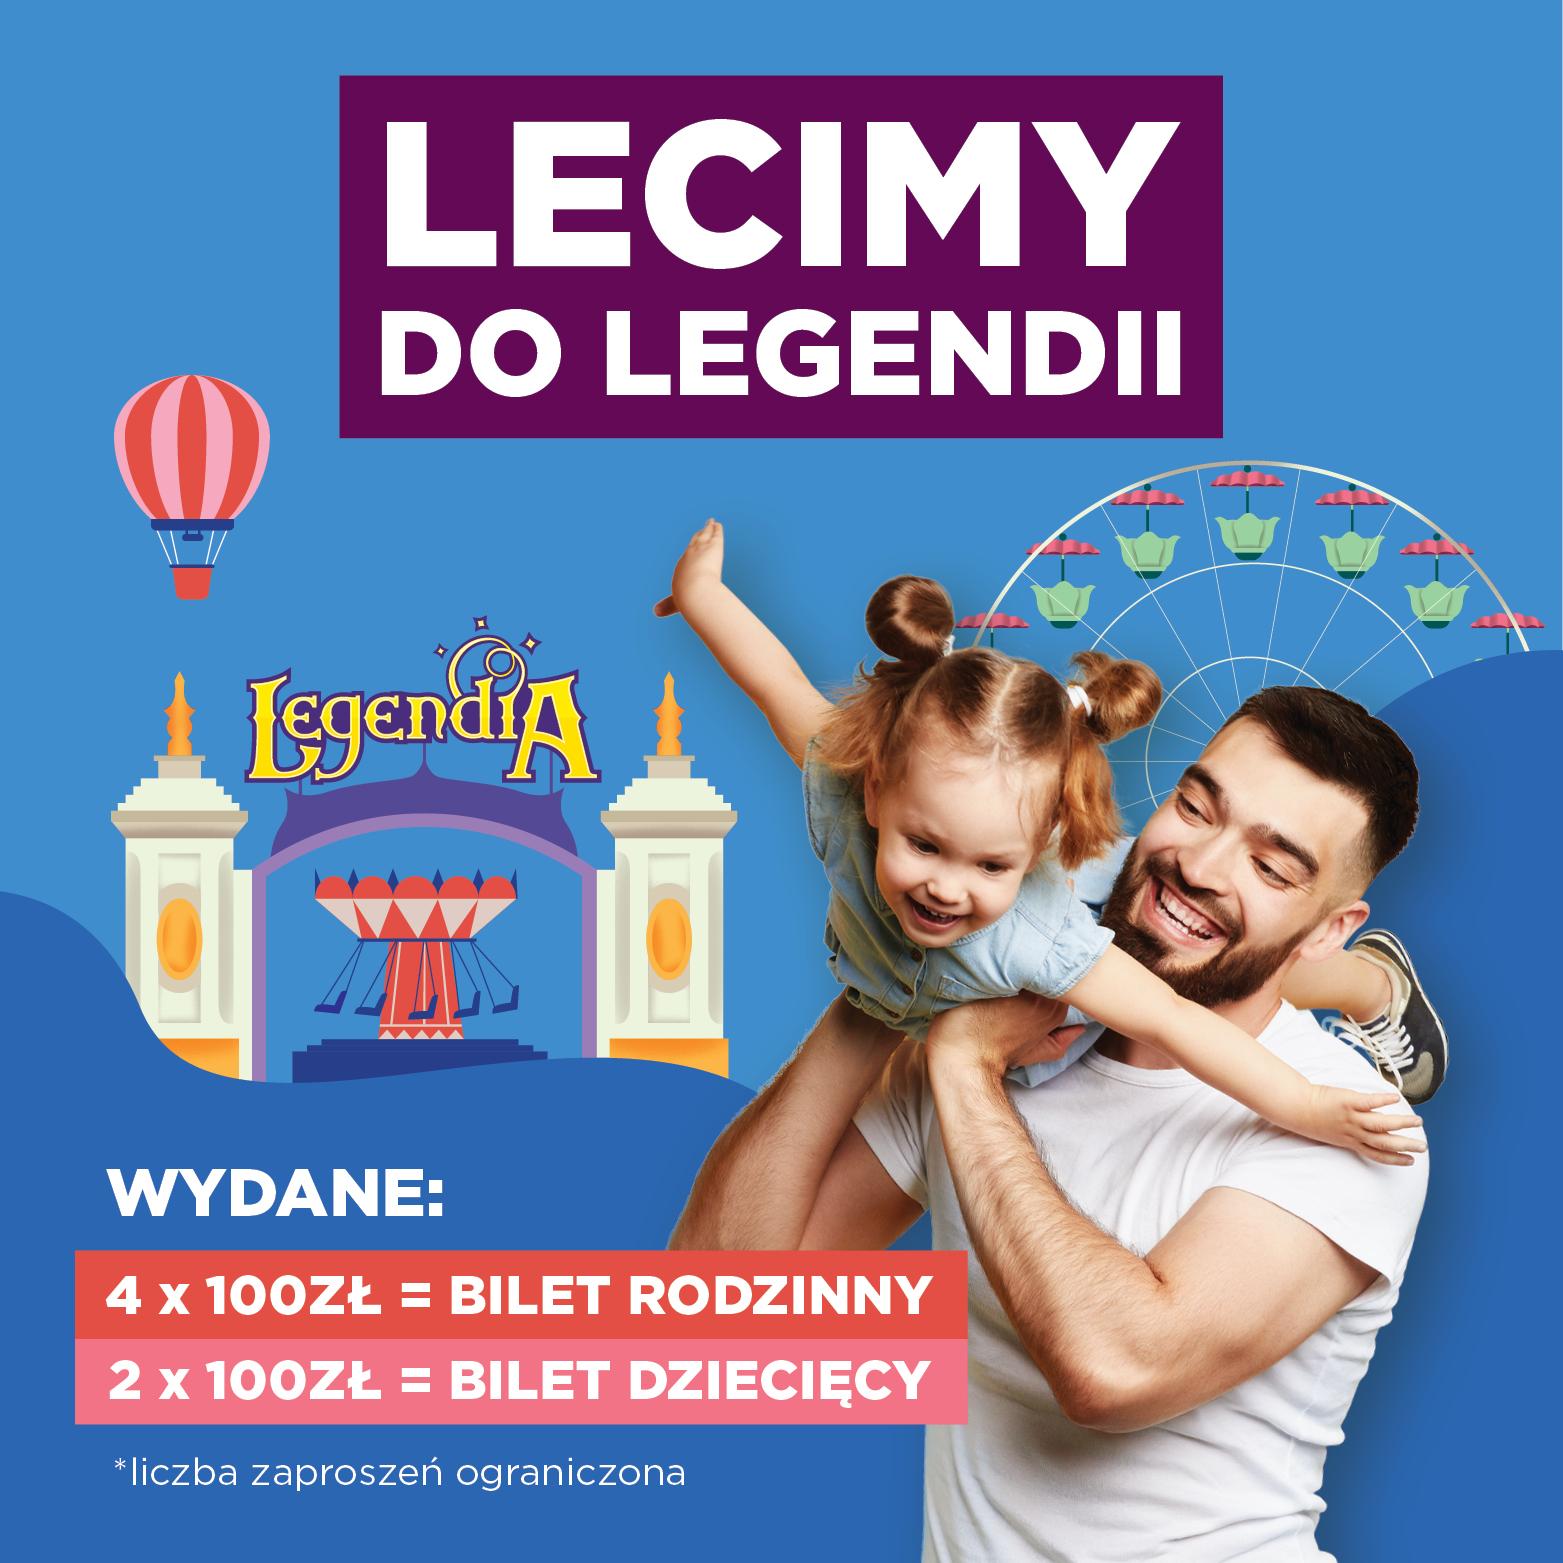 LECIMY DOLEGENDII